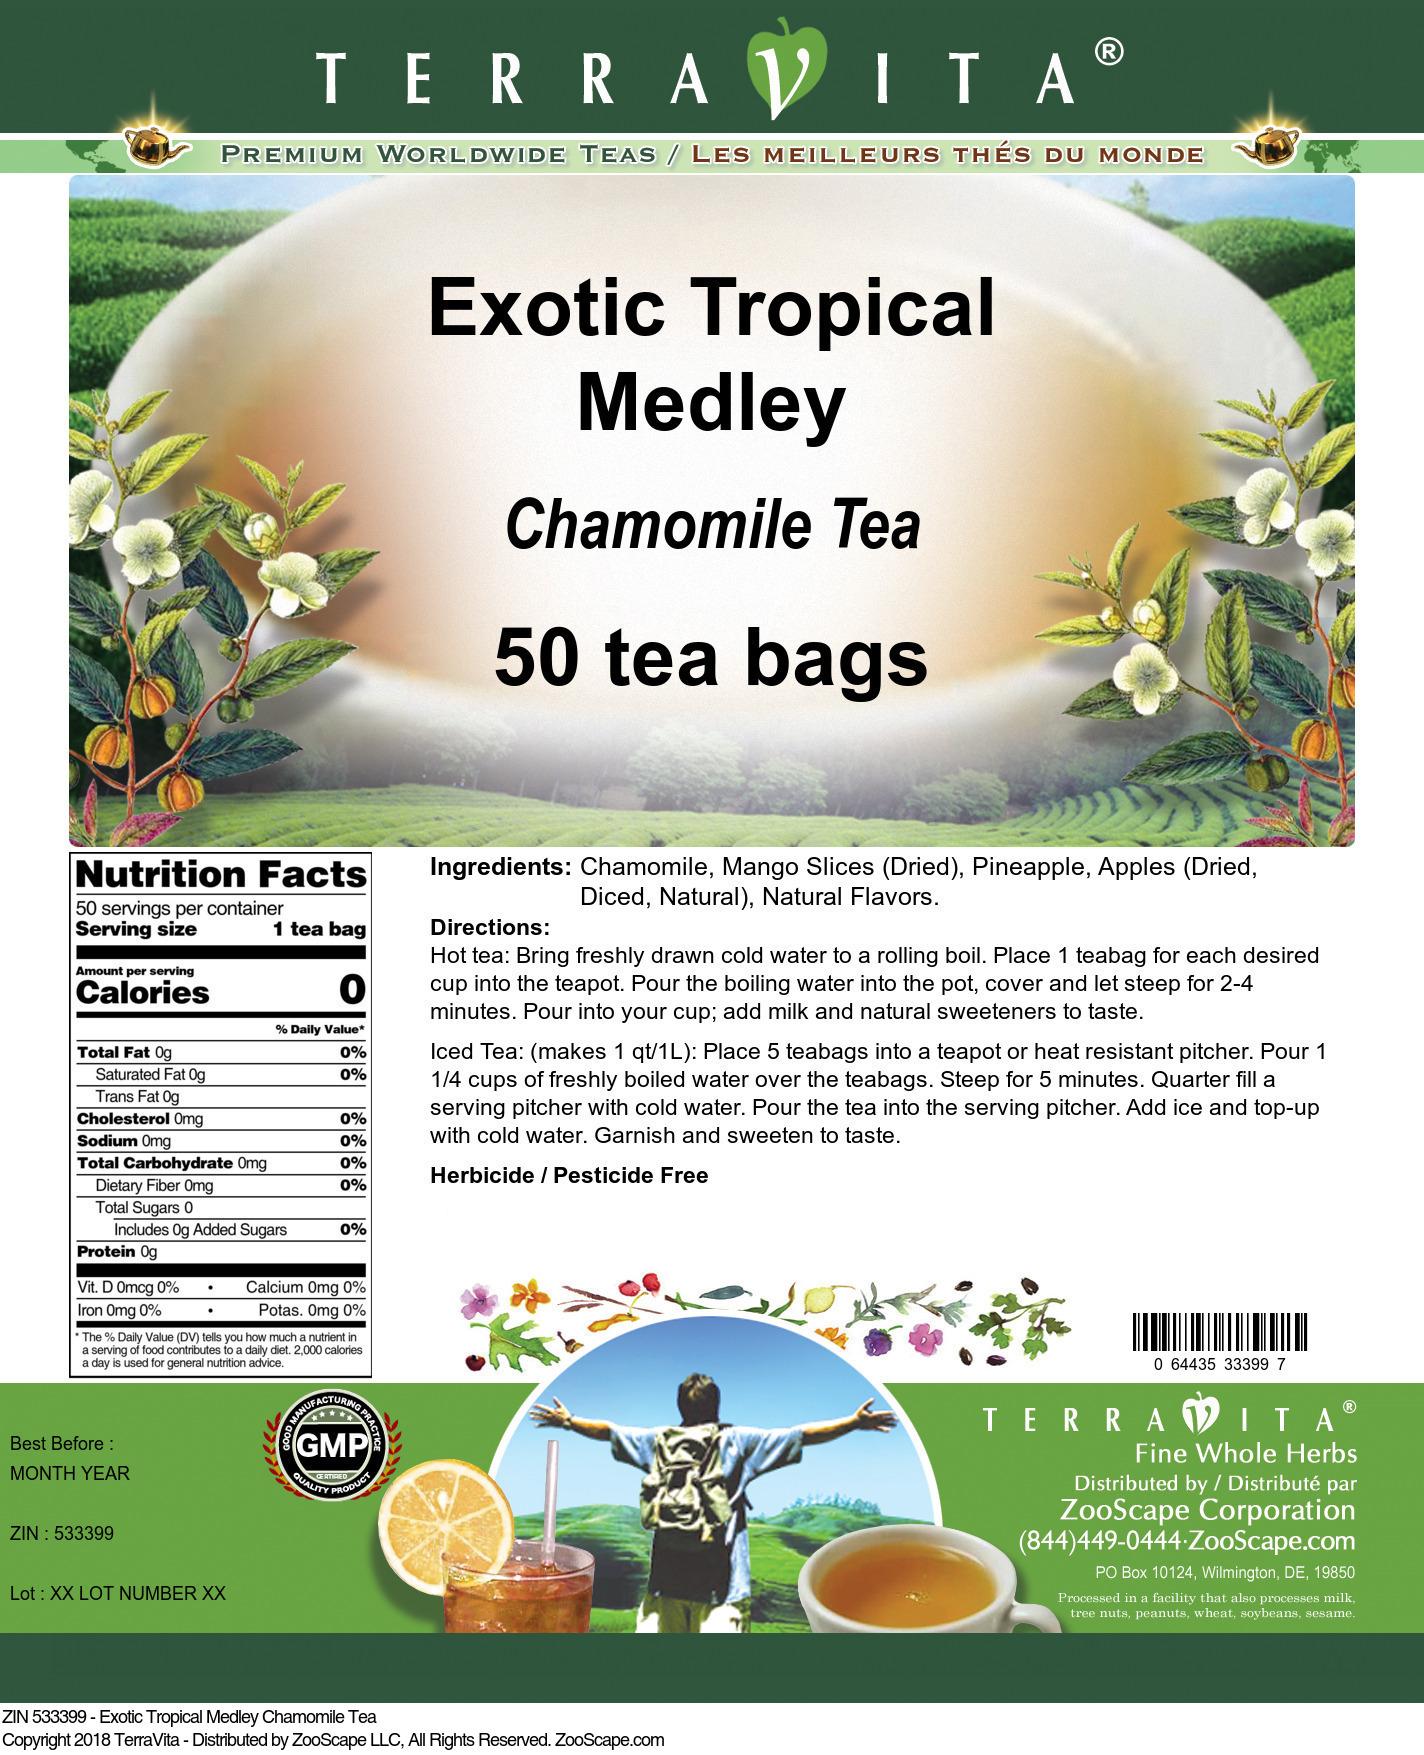 Exotic Tropical Medley Chamomile Tea